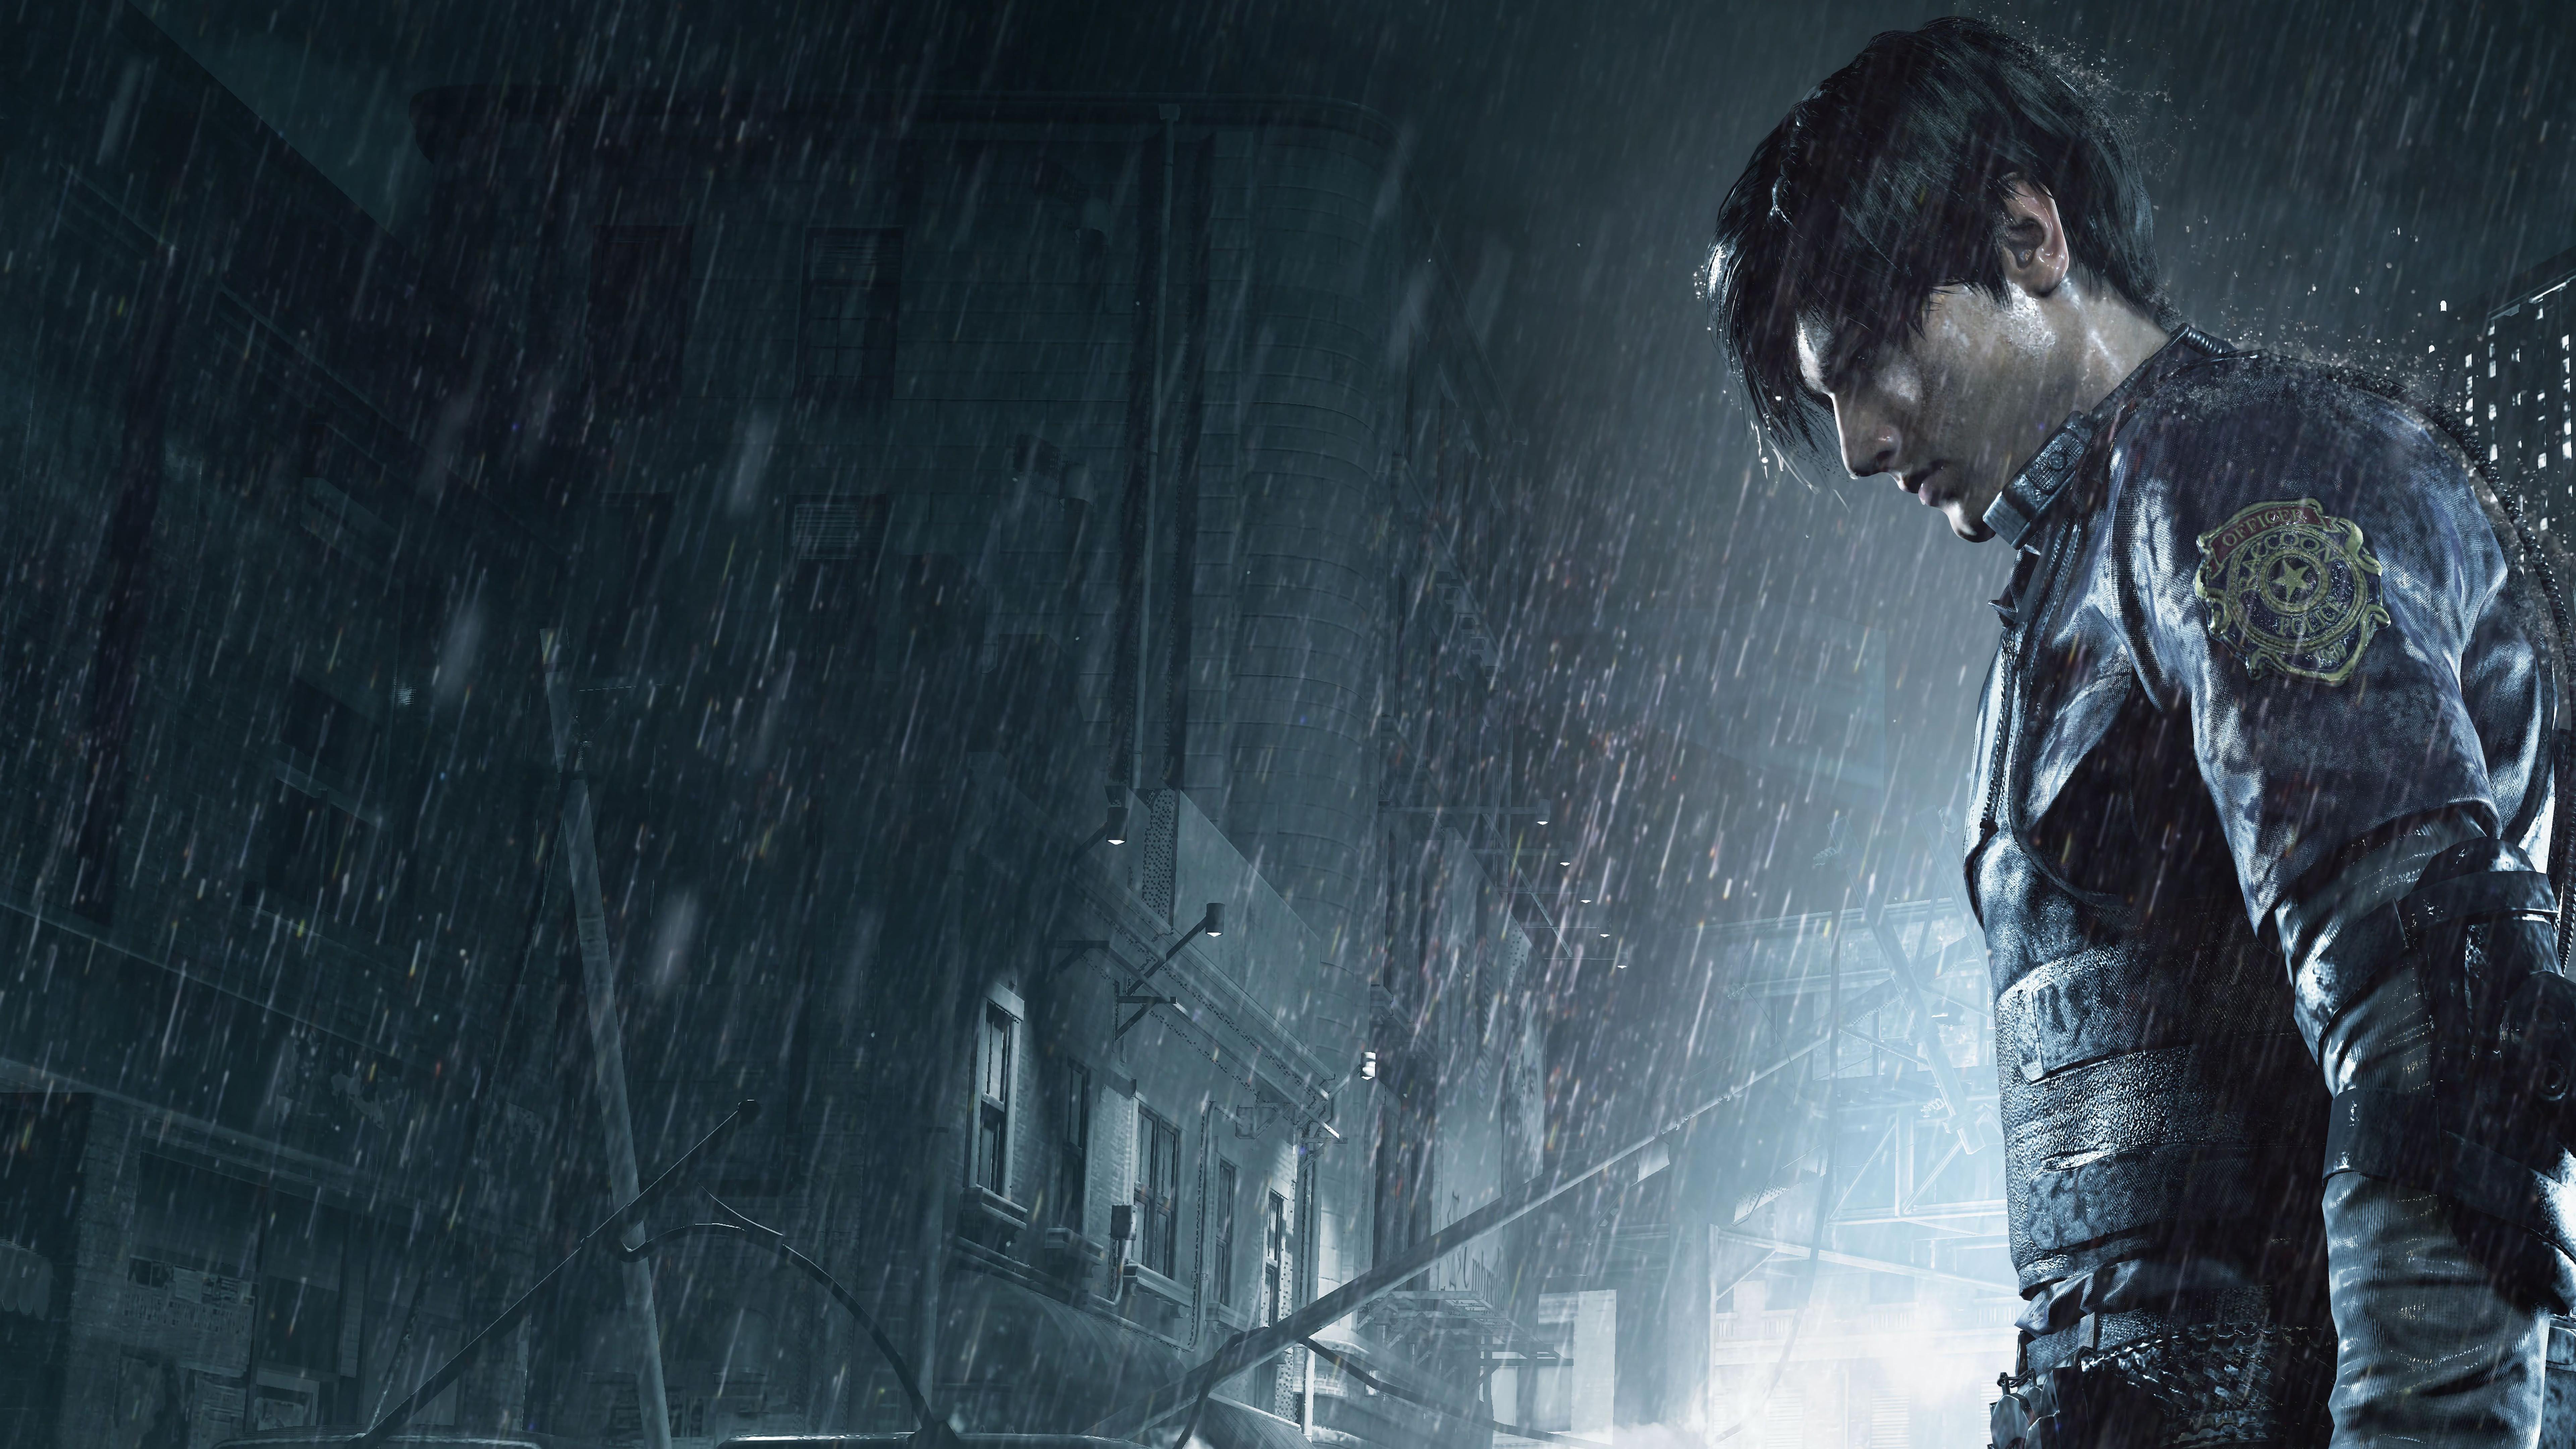 Леон - Resident Evil 2 8K, Арт